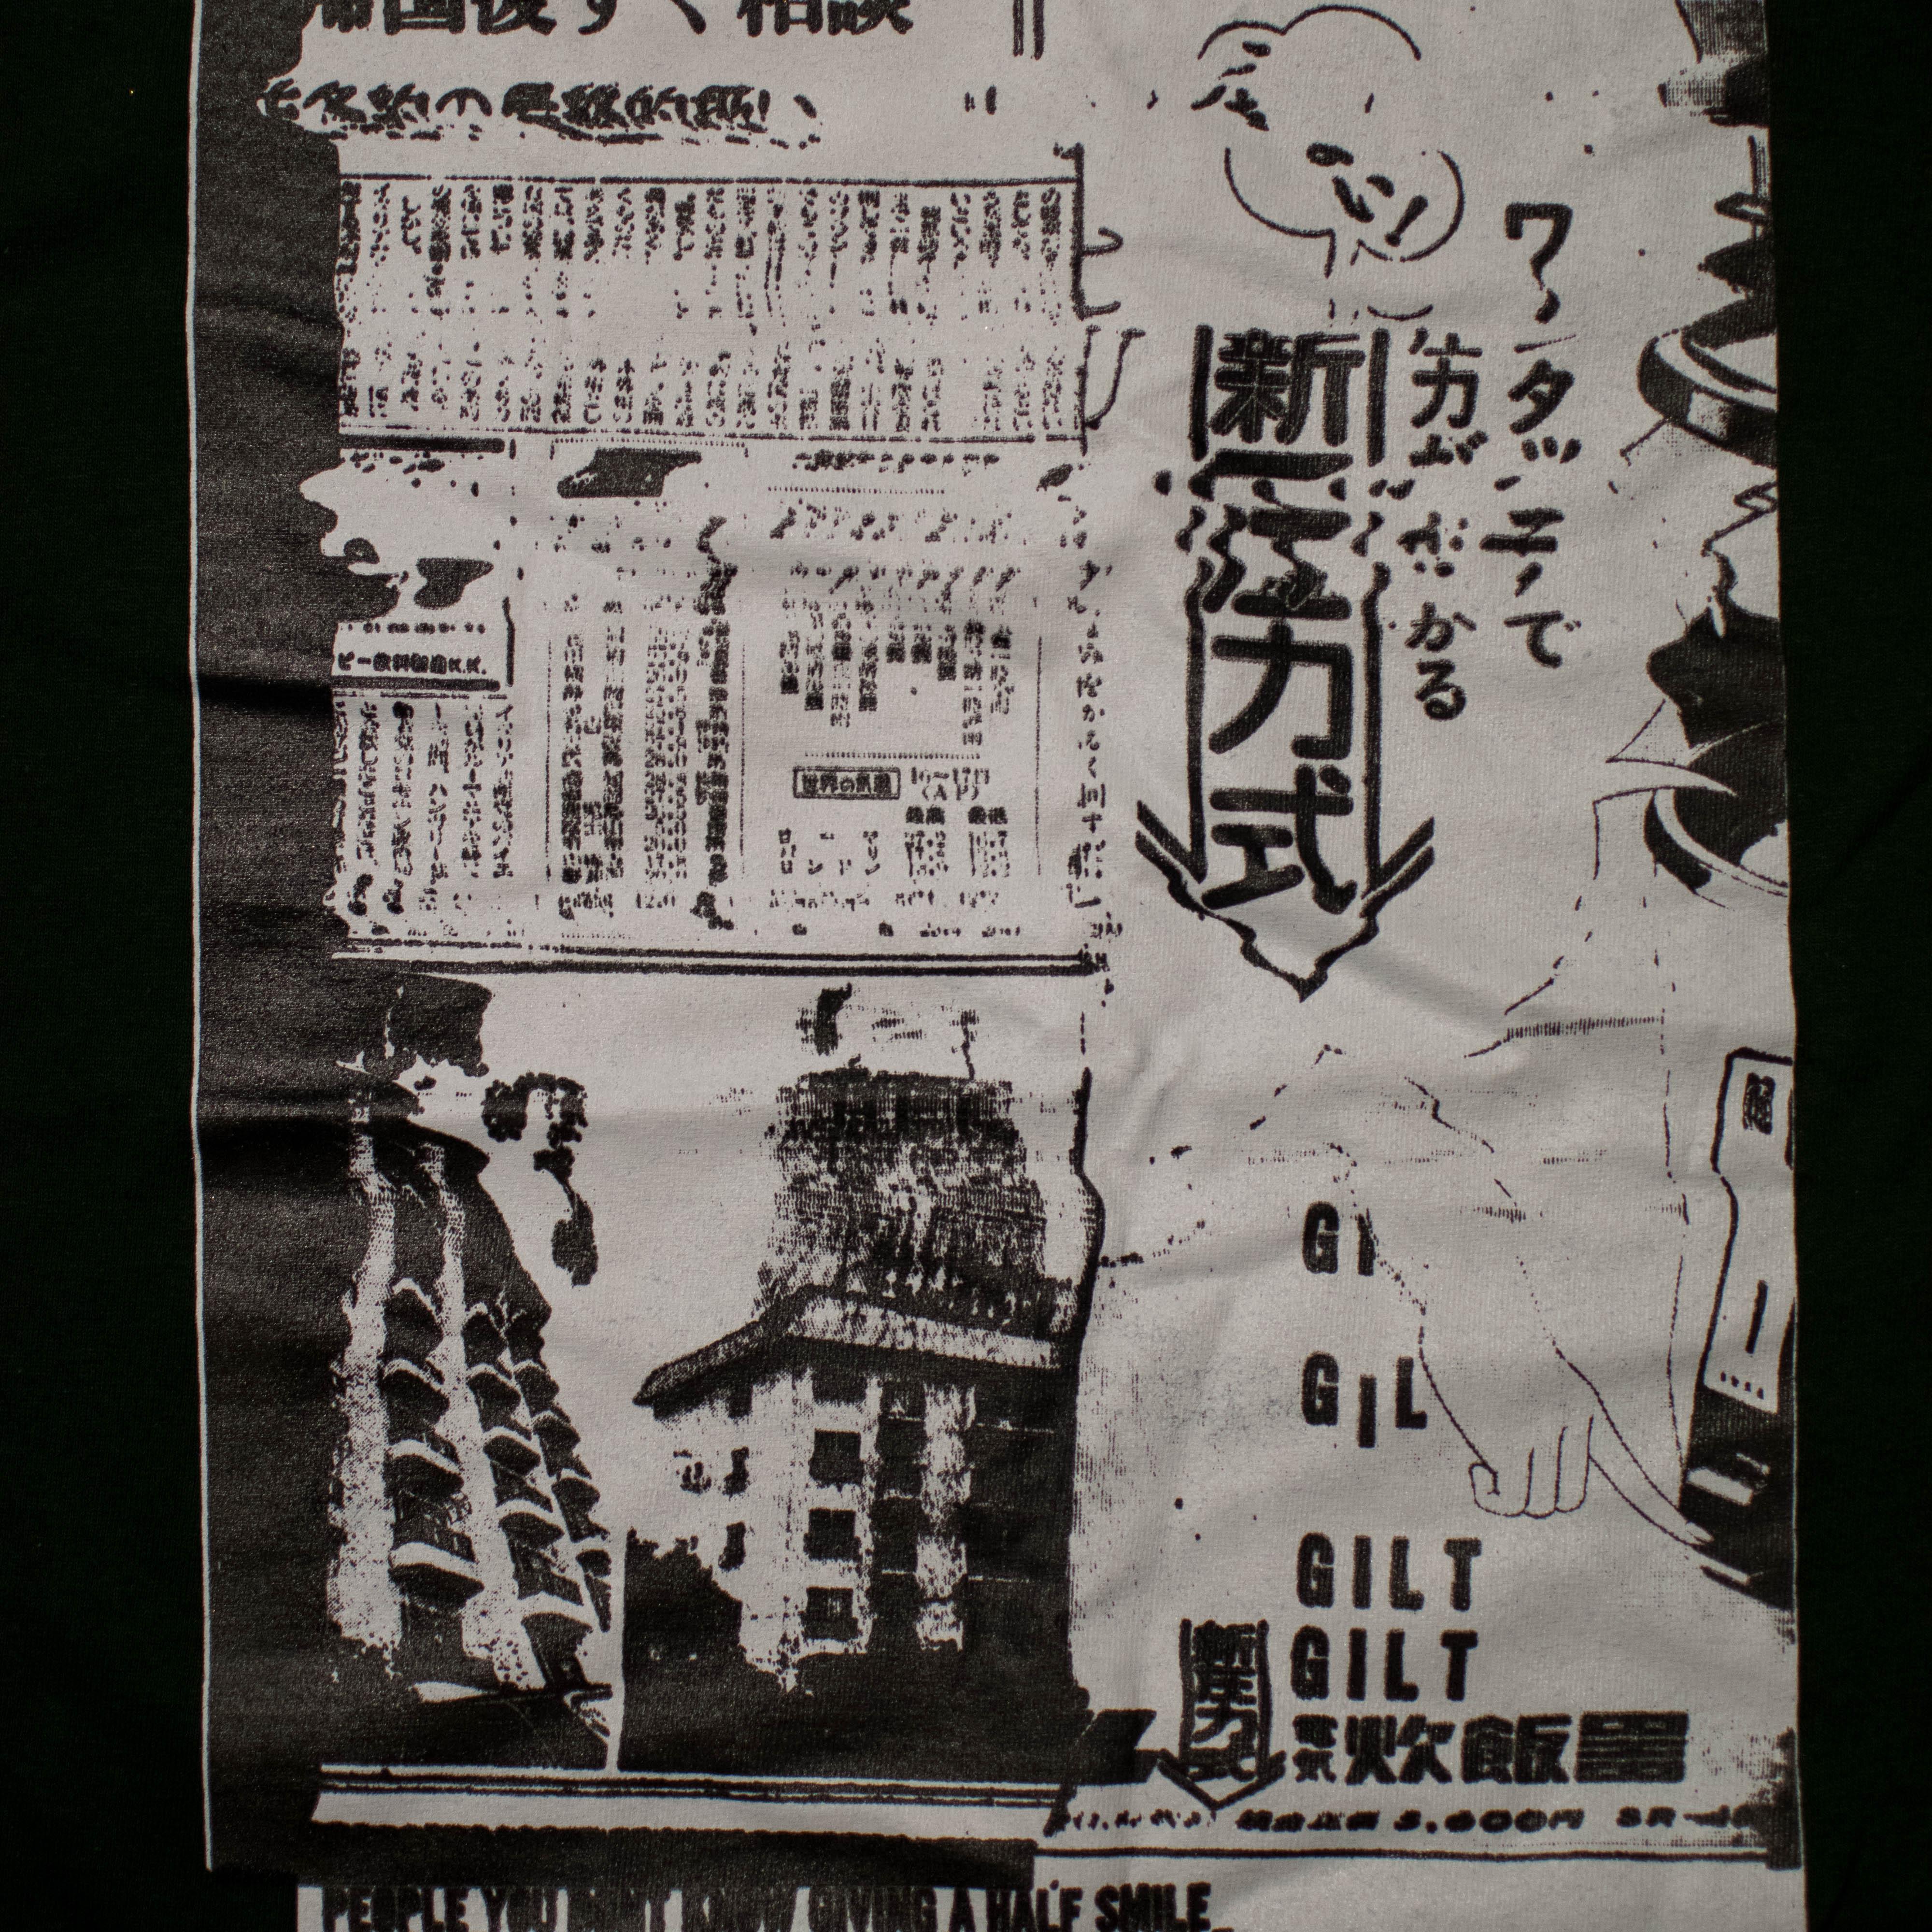 GILT | Japanese Newsprint Tee